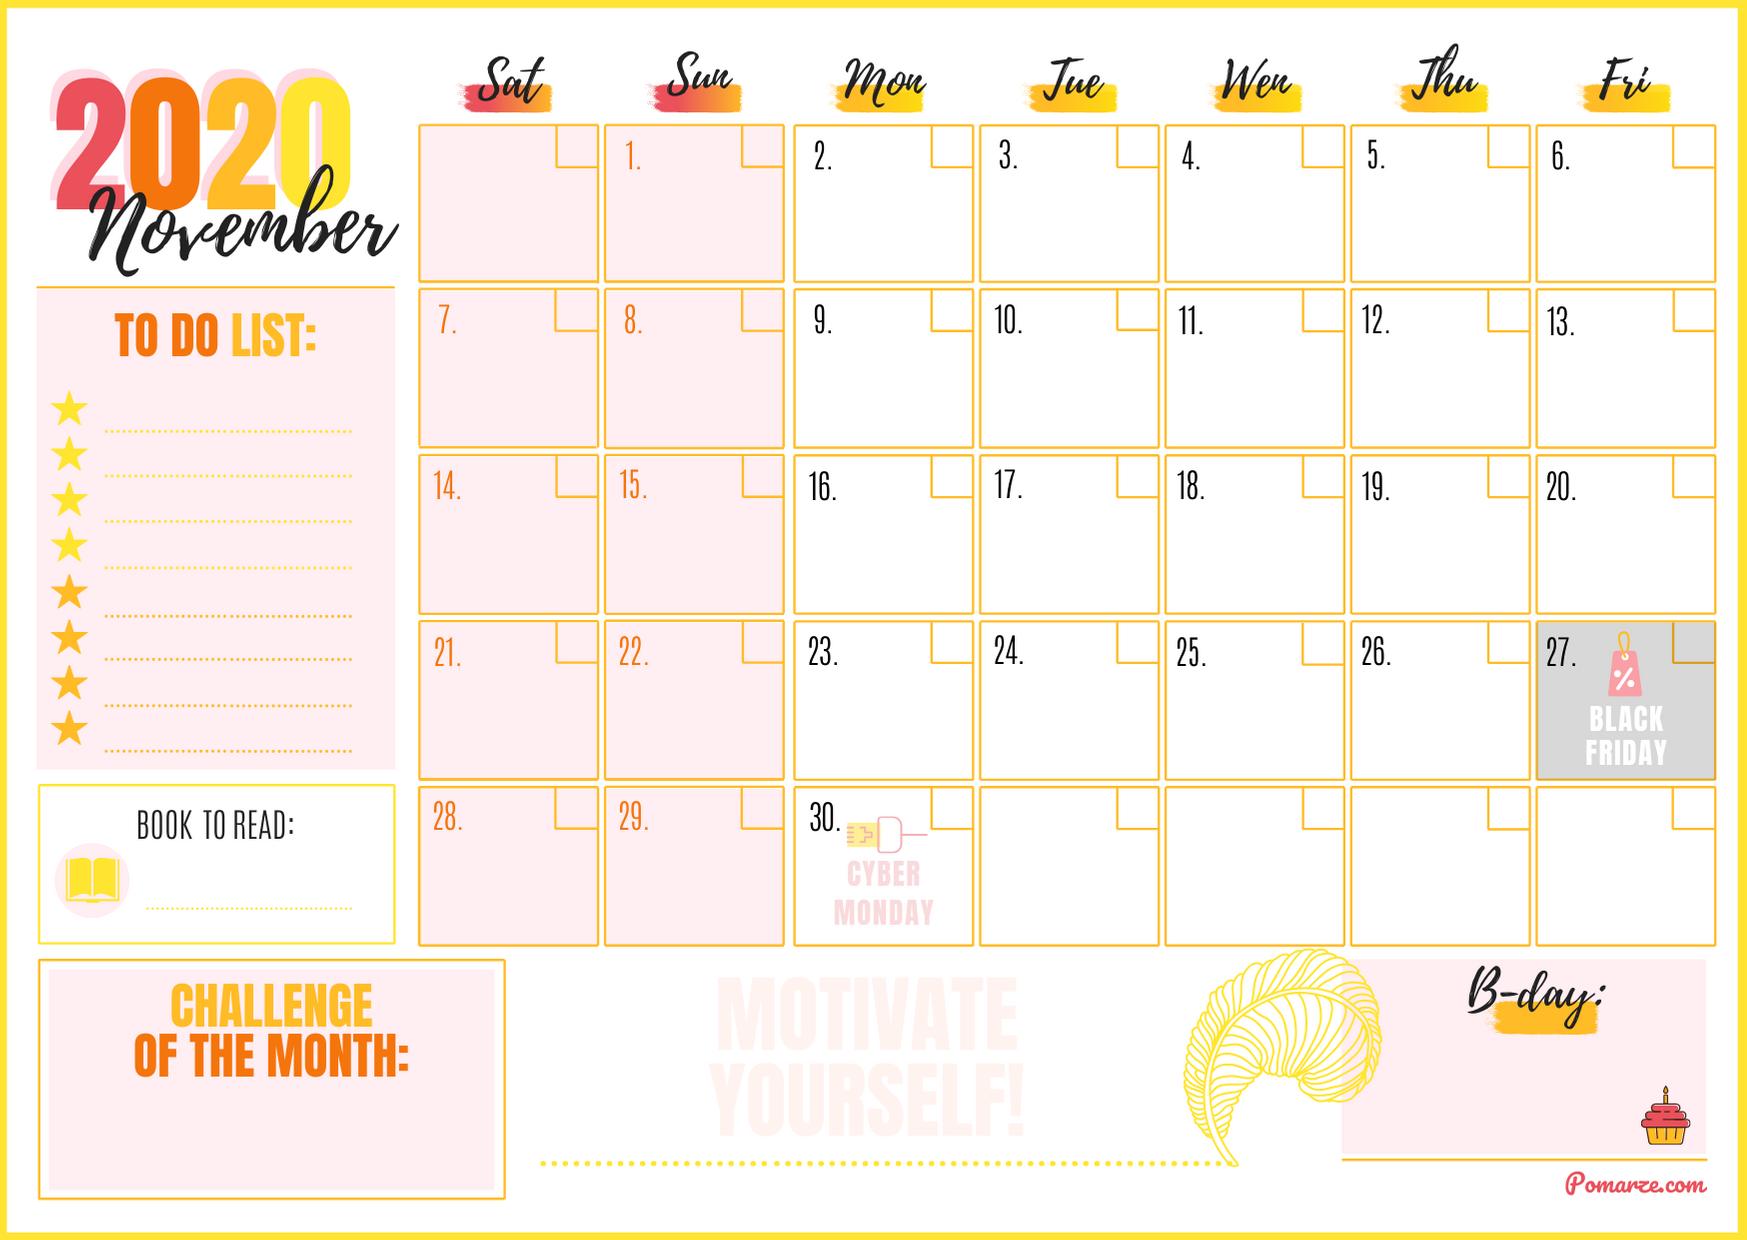 Monthly Calendar Planner November 2020 Printable pdf